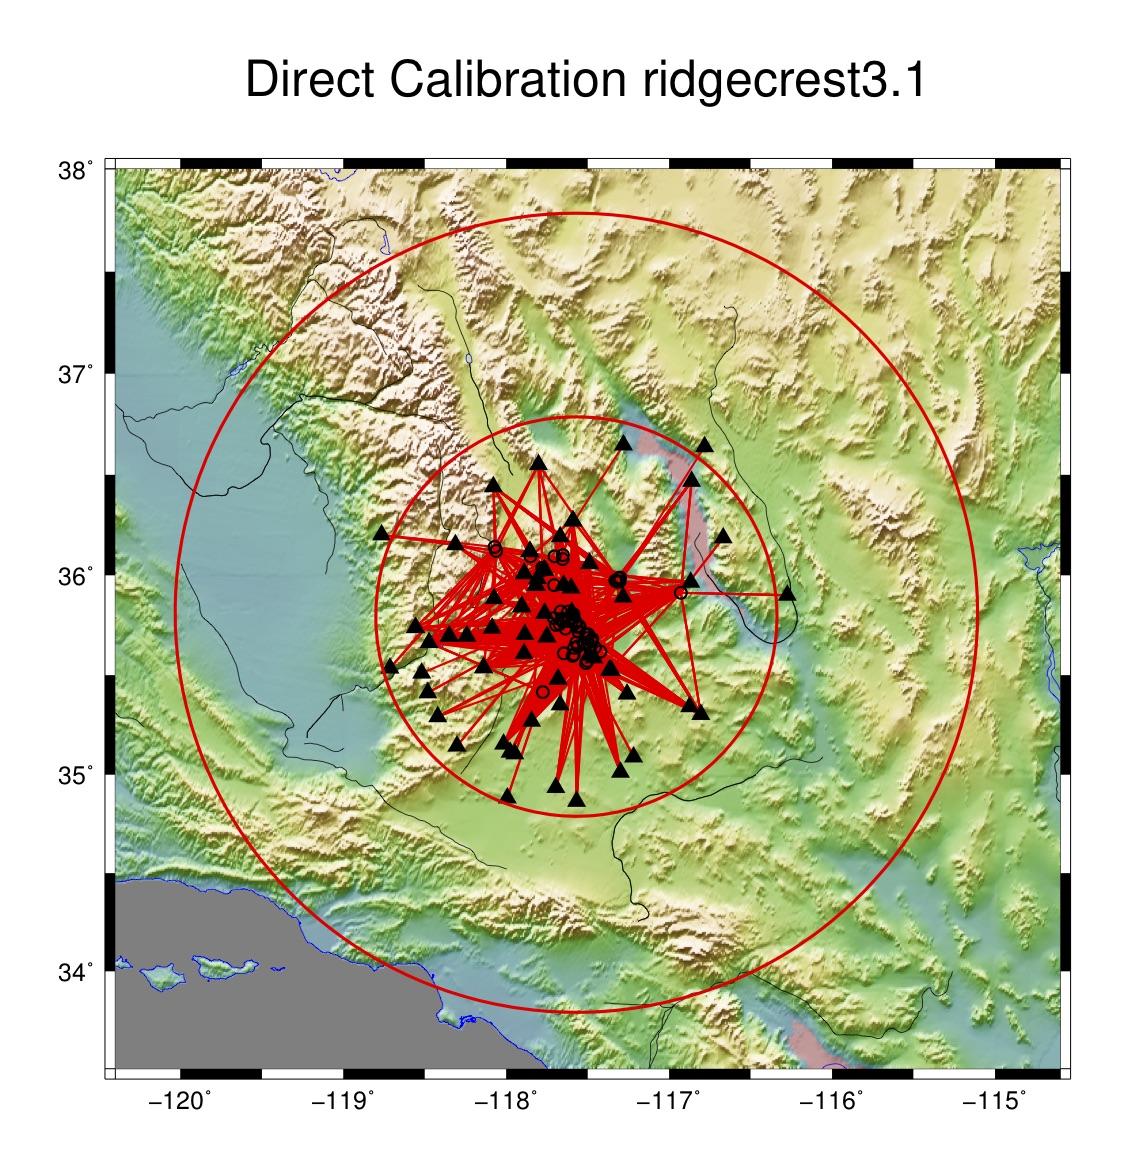 ridgecrest3.1 direct calibration raypath plot